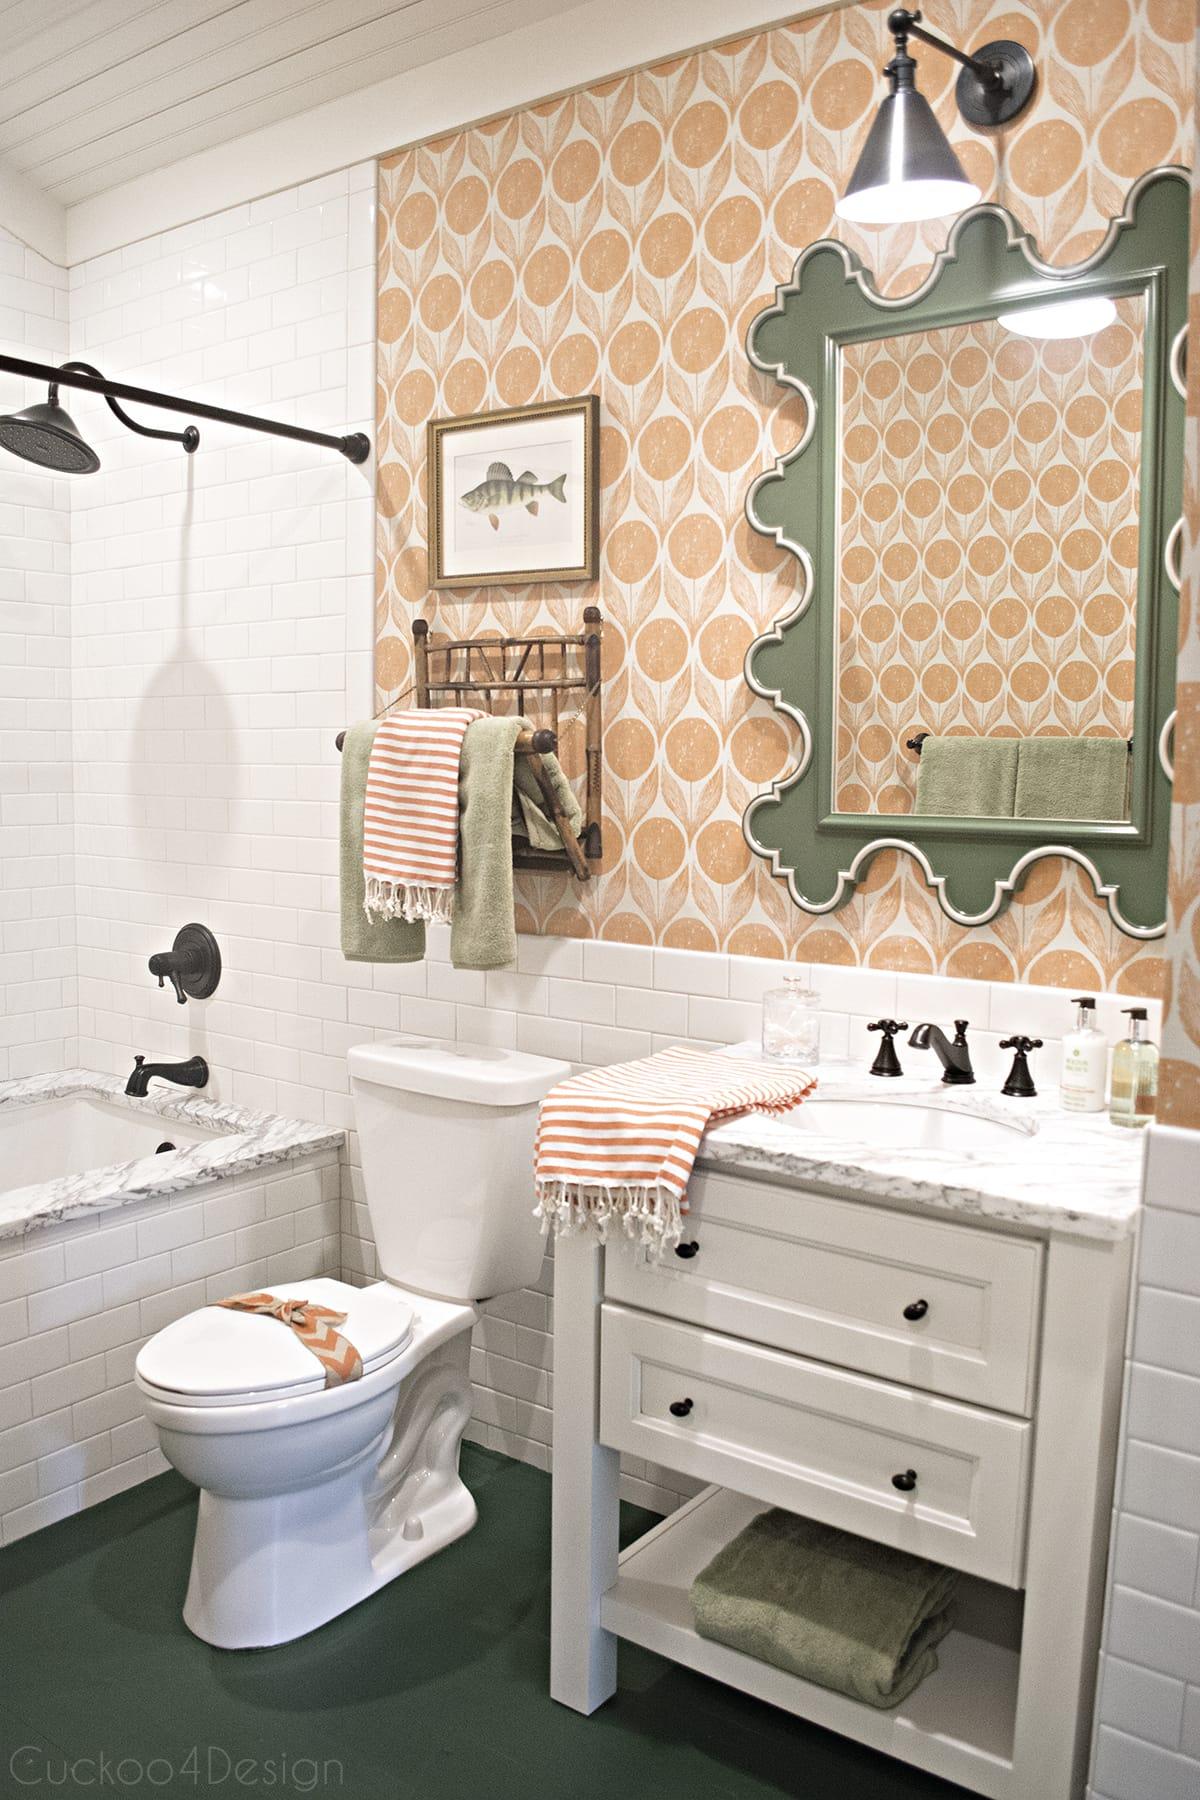 Romo Clementine wallpaper, green scalloped mirror with orange wallpaper and @deltafaucet fixtures in bathroom